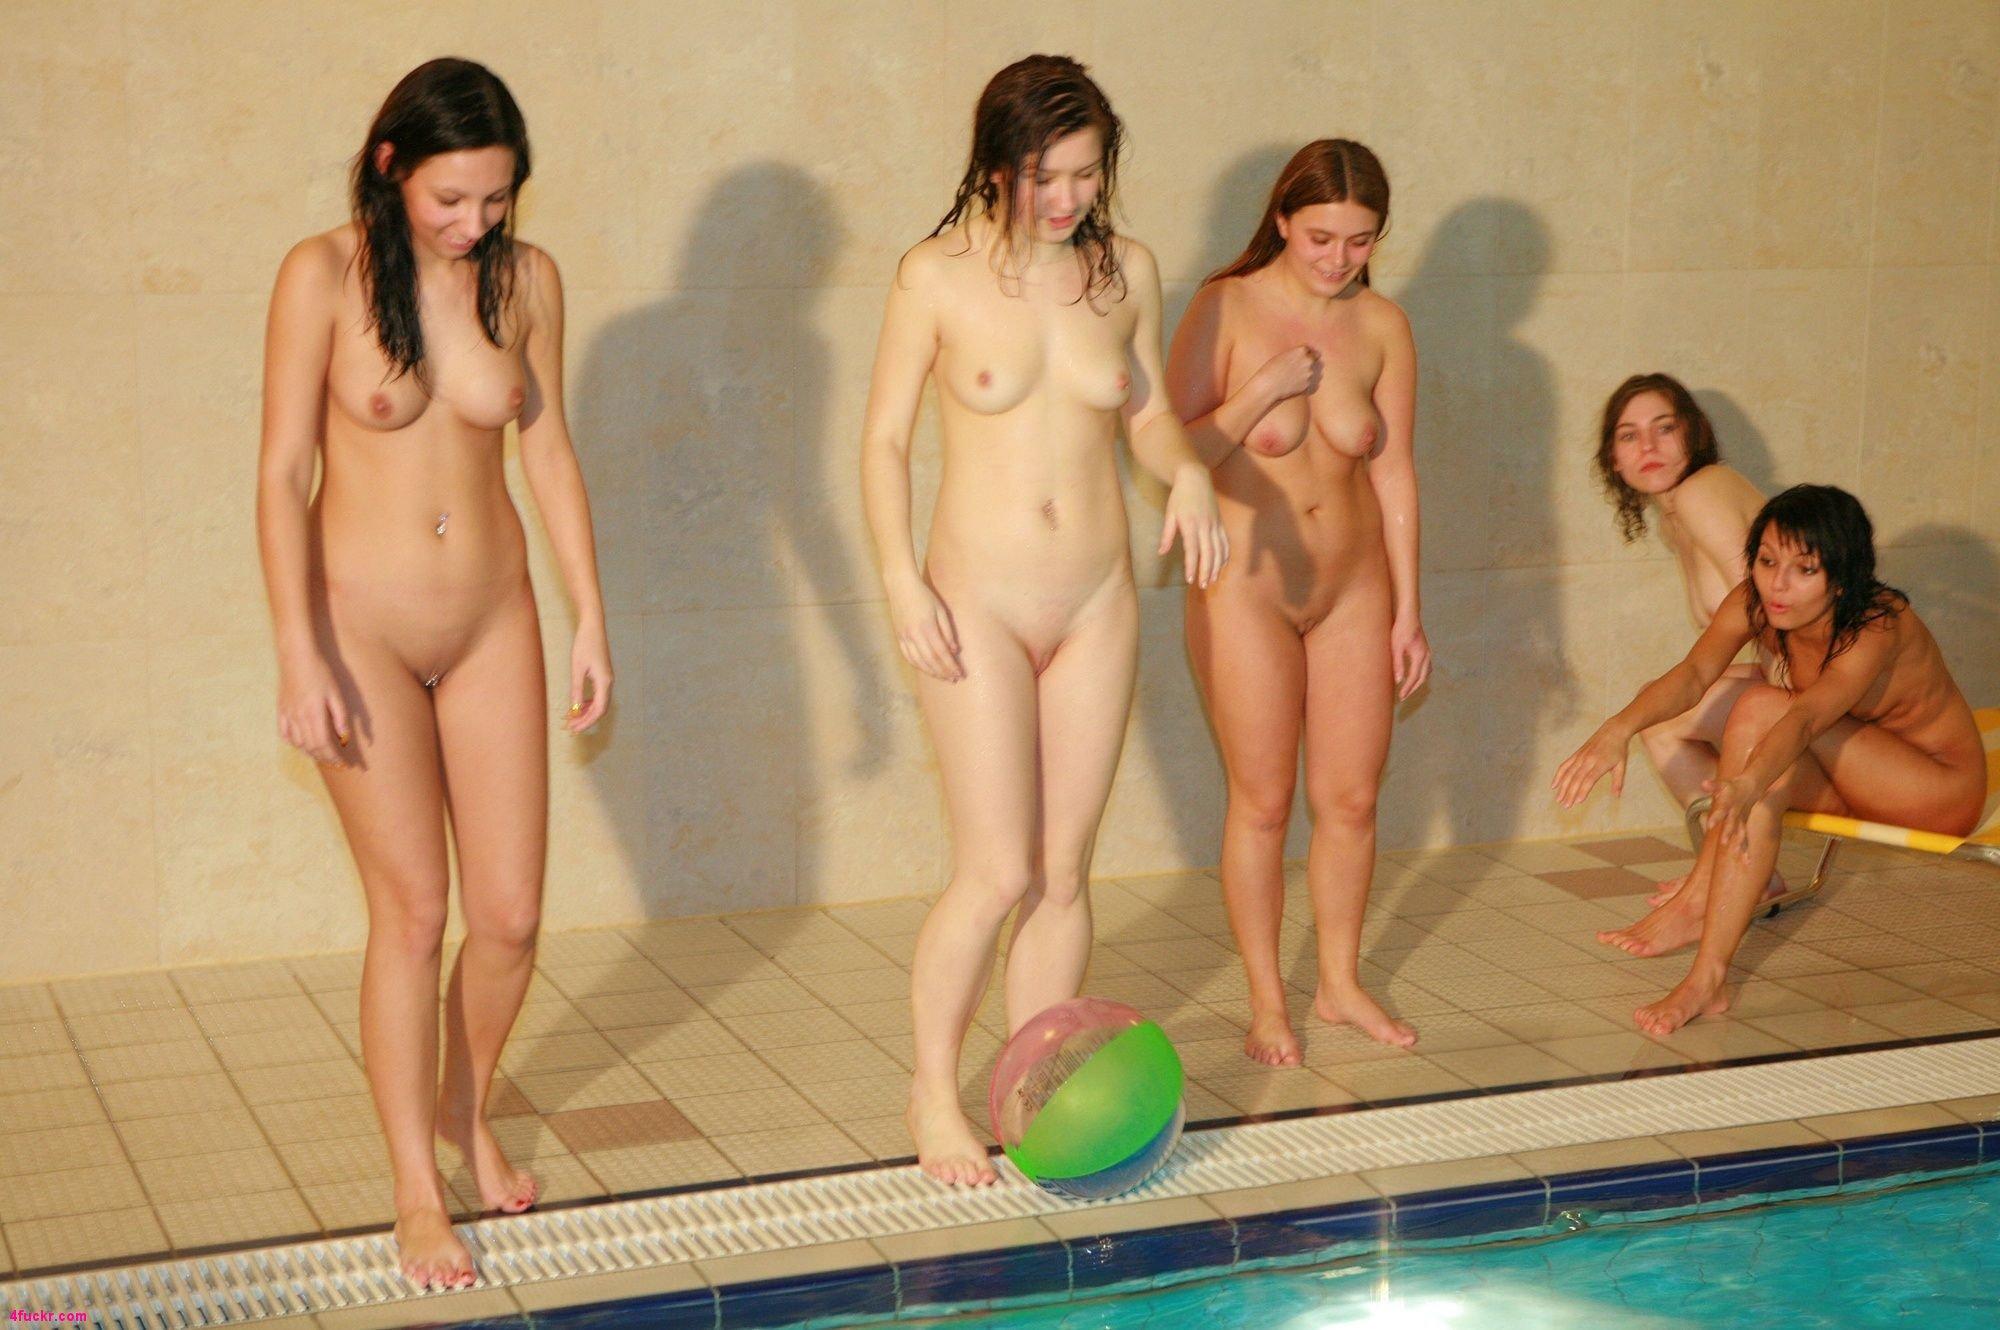 sex fun party fkk bildr